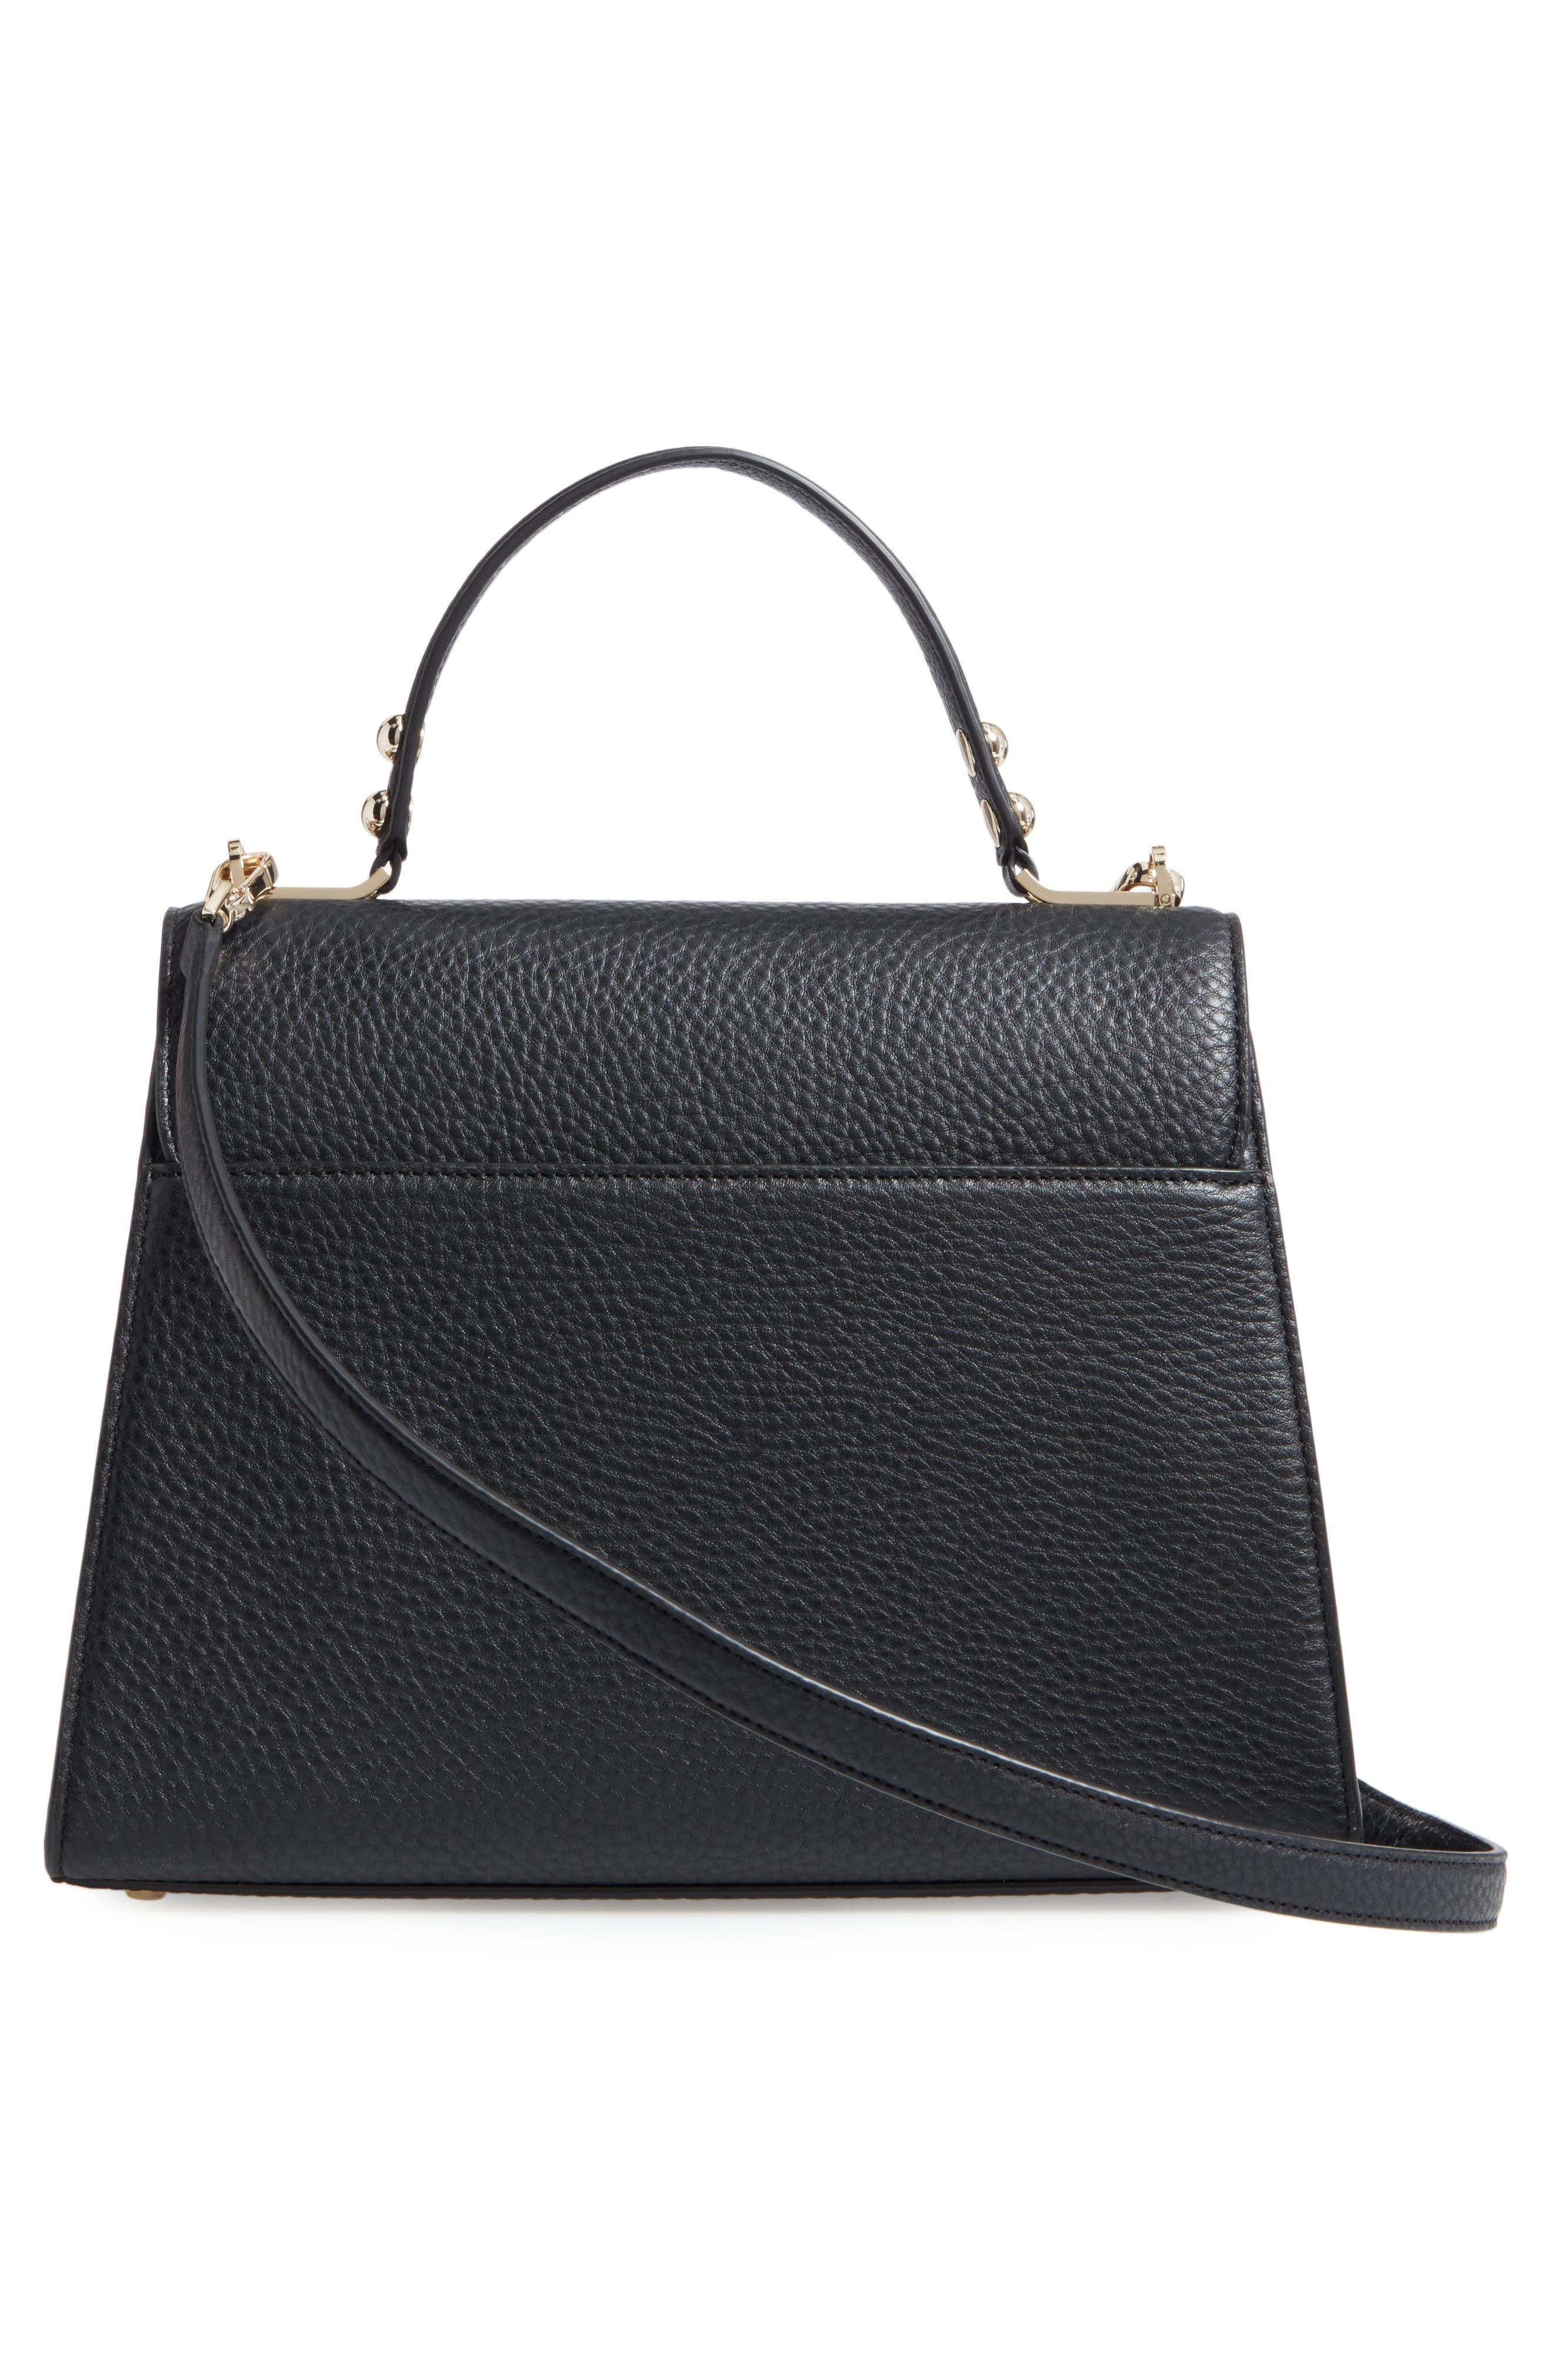 stewart street samira leather top handle satchel,                             Alternate thumbnail 2, color,                             Black